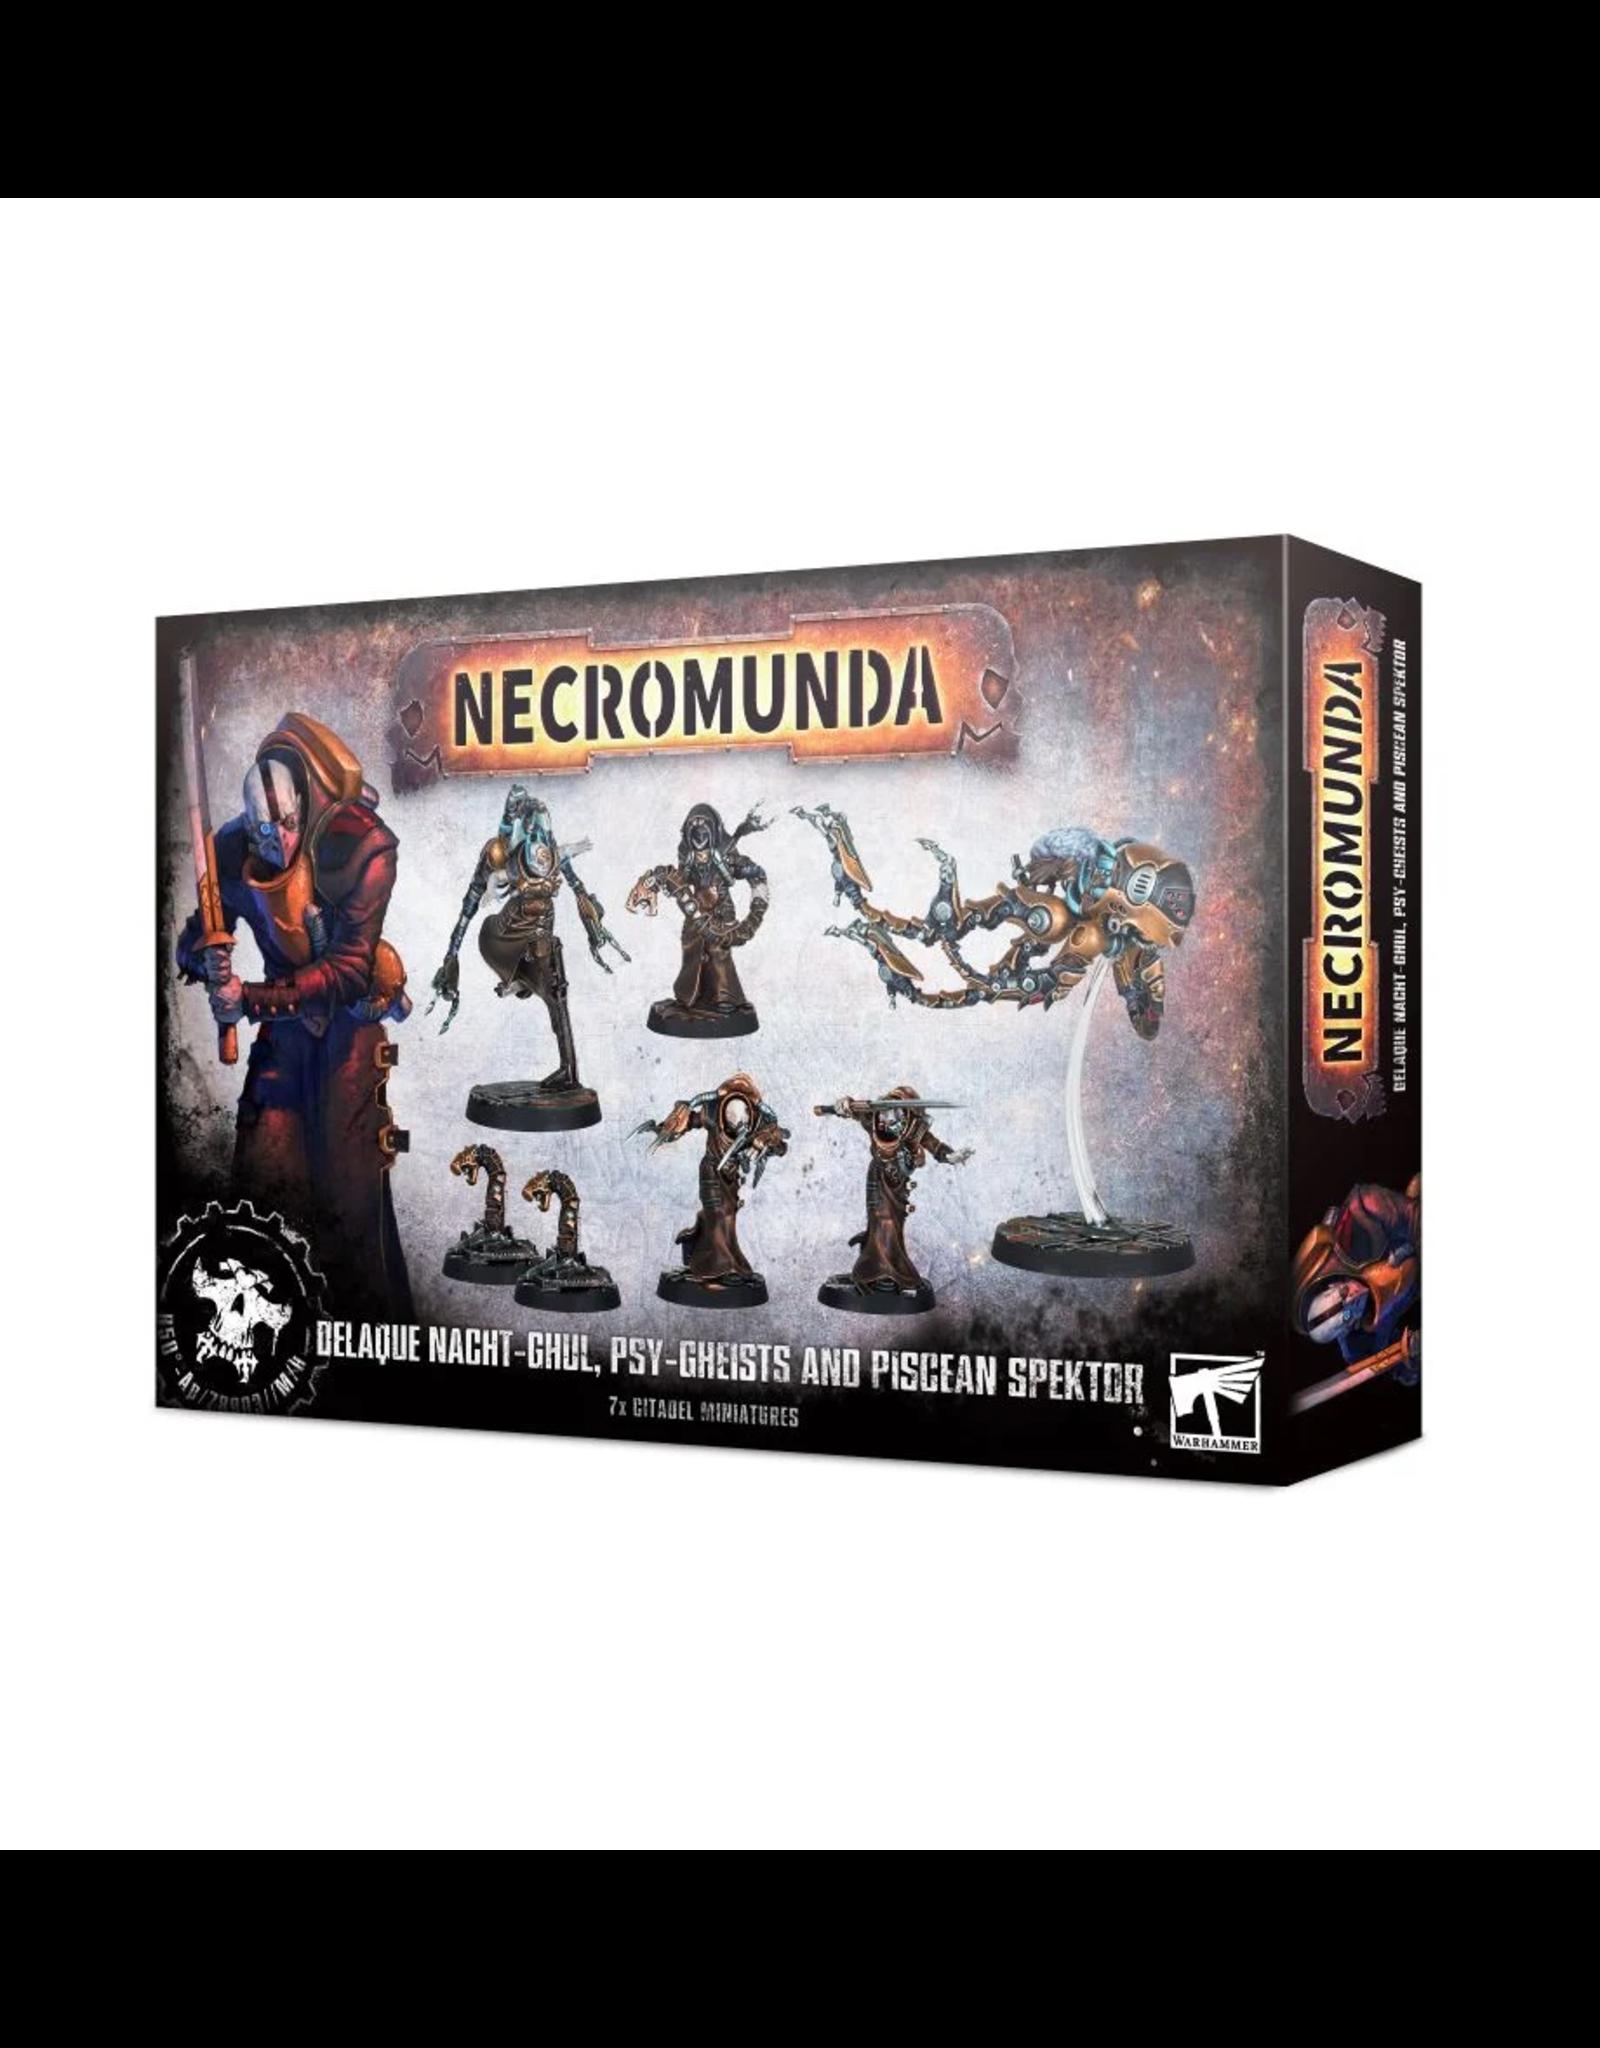 Games Workshop Necromunda- Delaque Nacht-Ghul, Psy-Gheists and Piscean Spektor